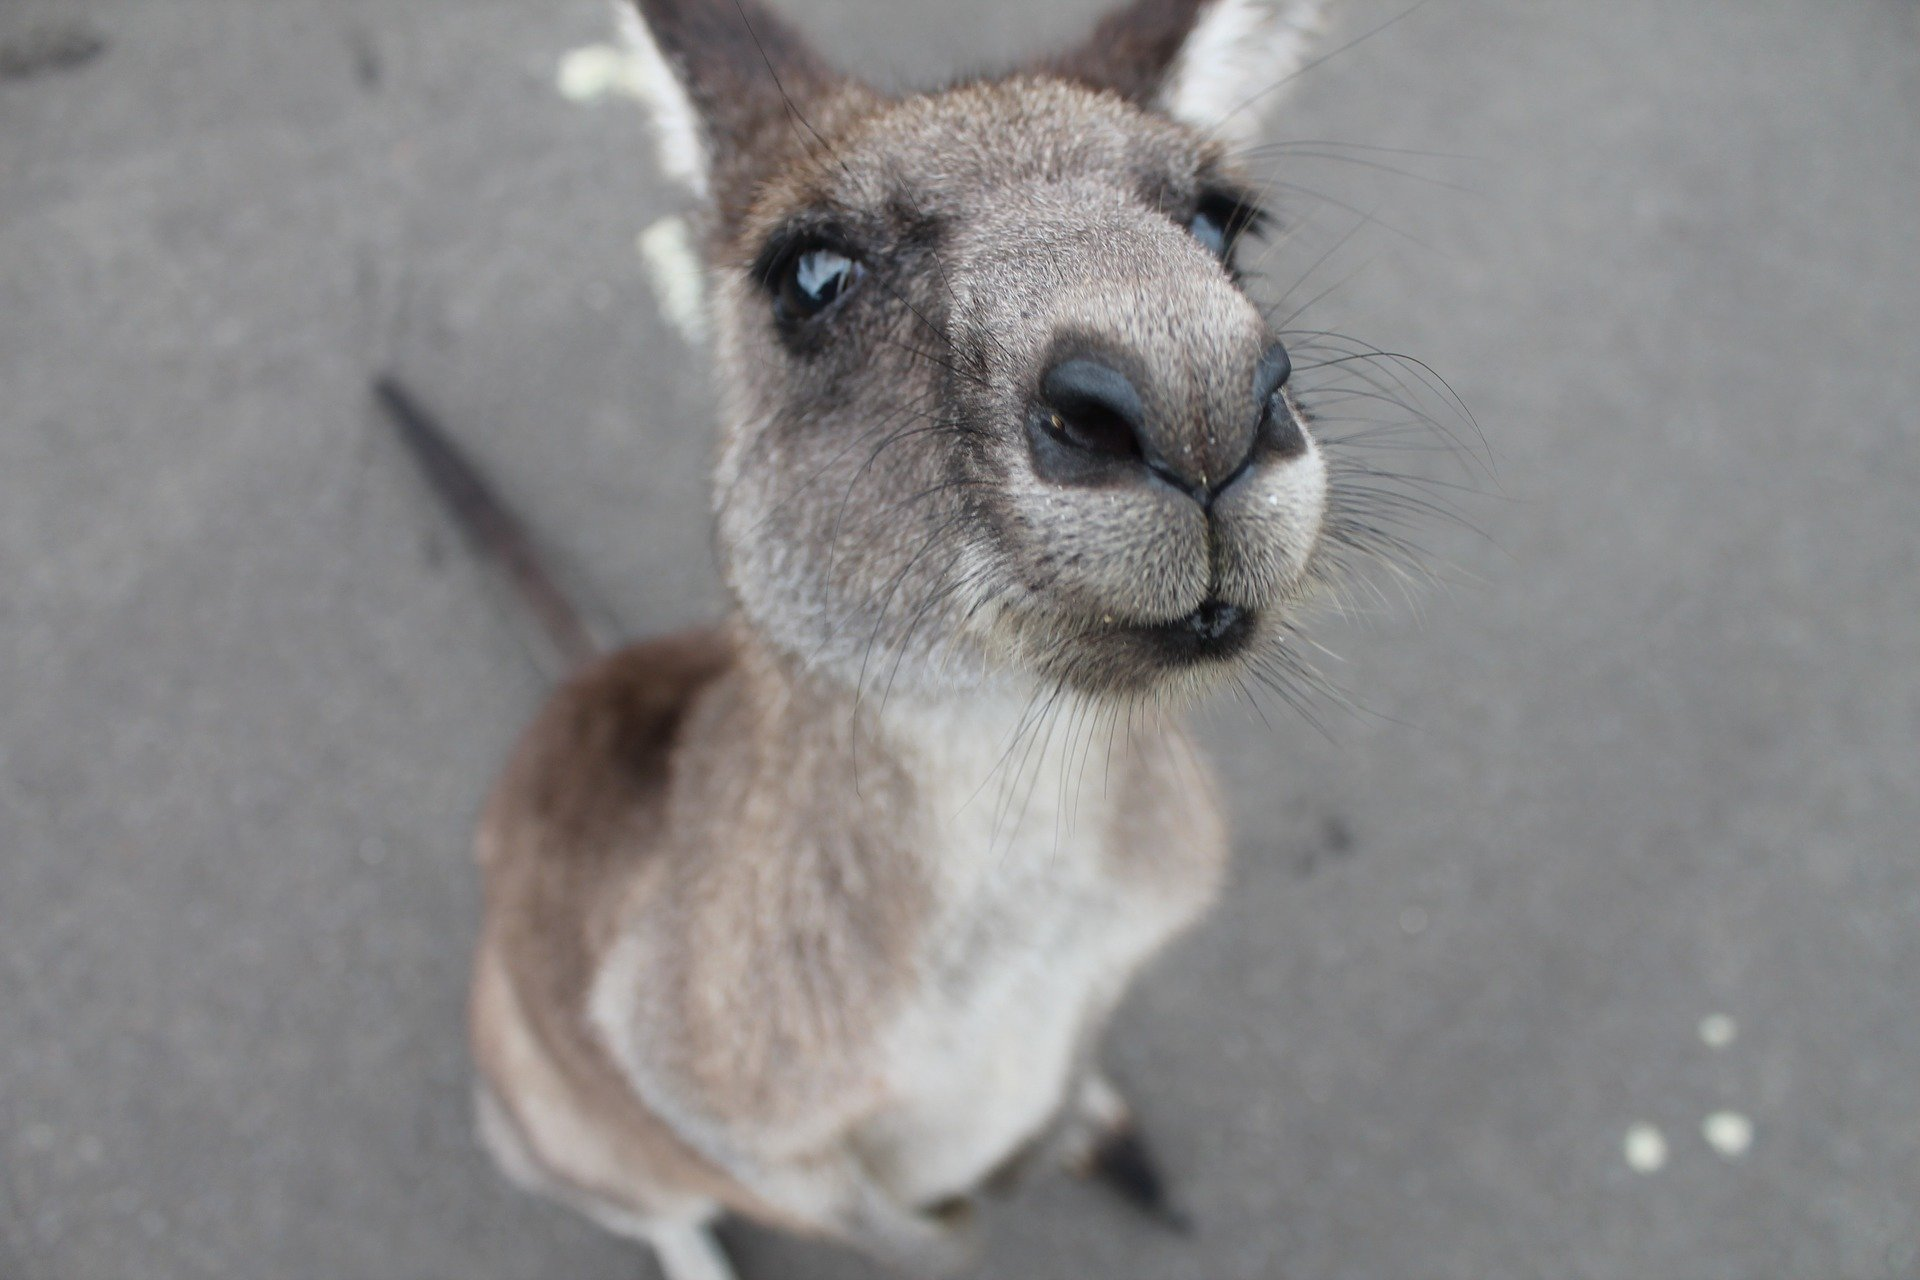 Australian animals under extreme stress in drought, bushfires